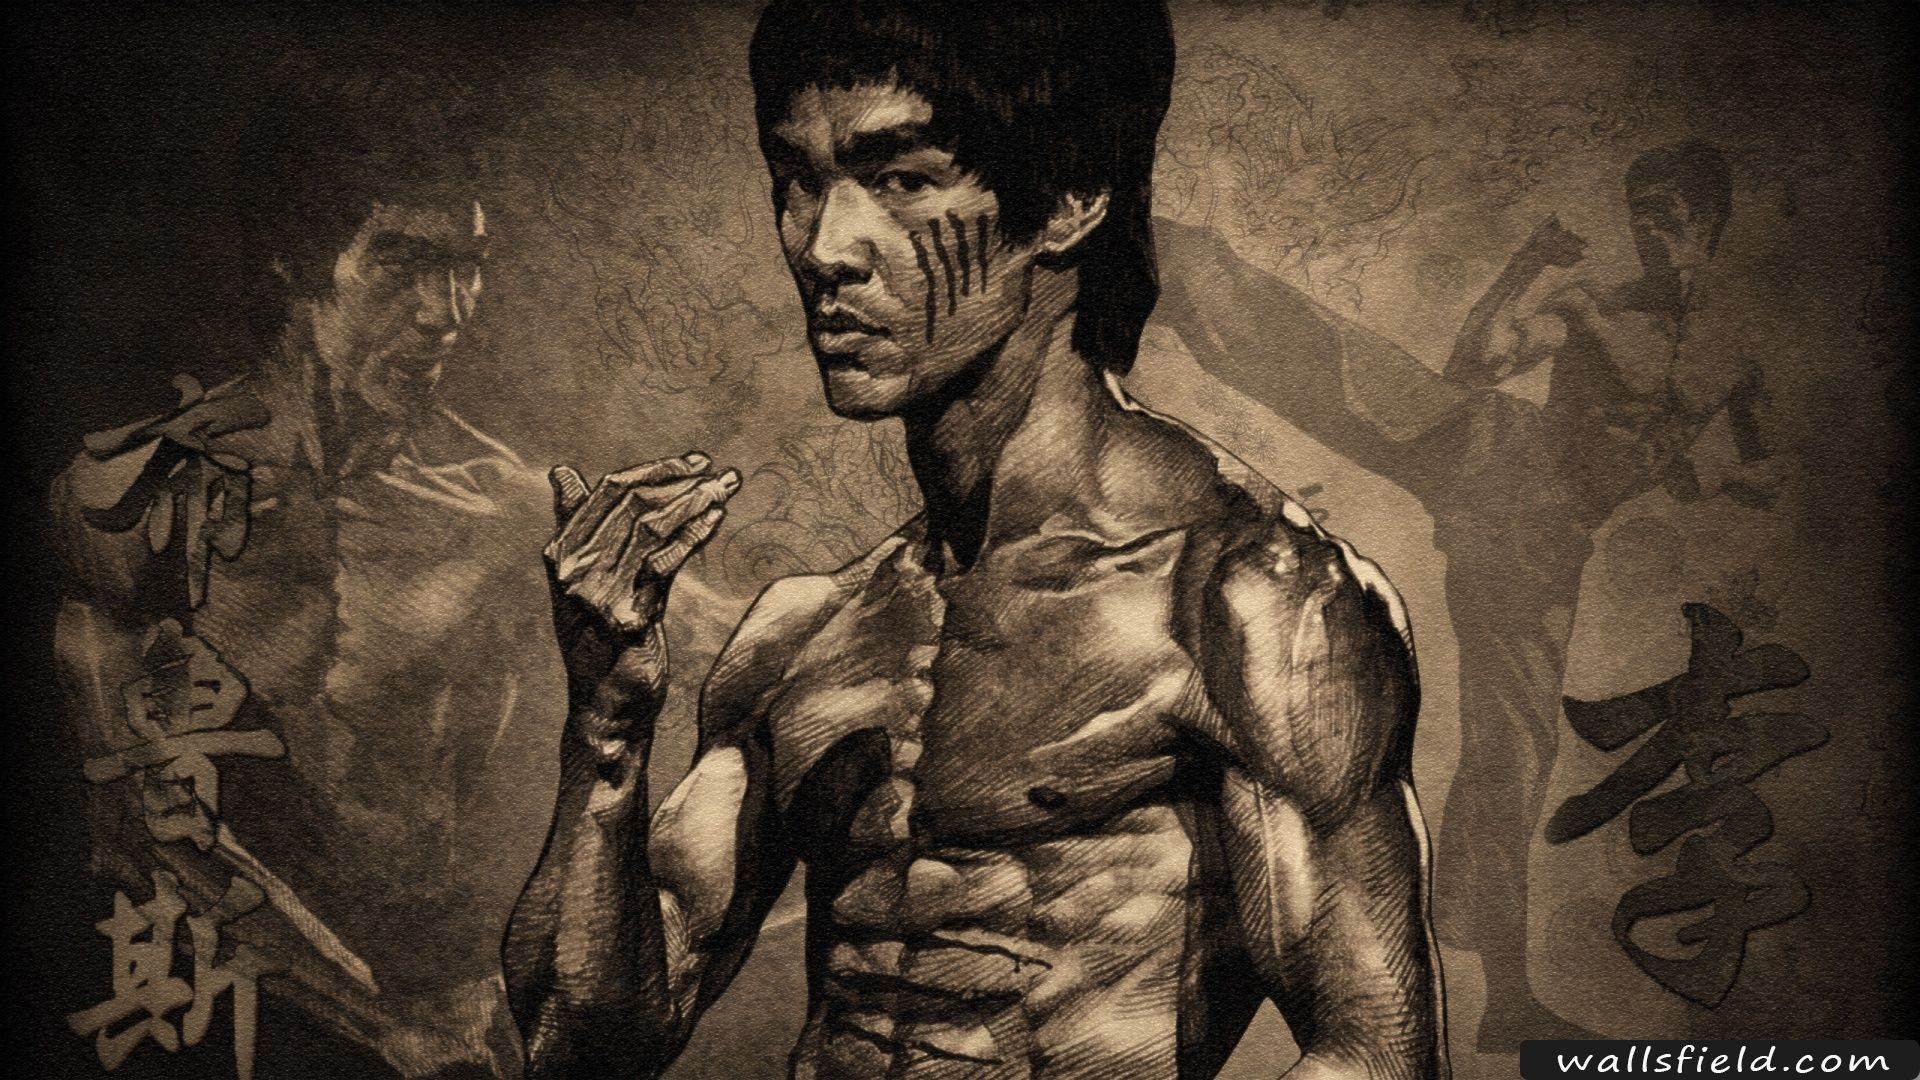 Bruce Lee Wallsfield Com Free Hd Wallpapers Bruce Lee Bruce Lee Martial Arts Bruce Lee Art